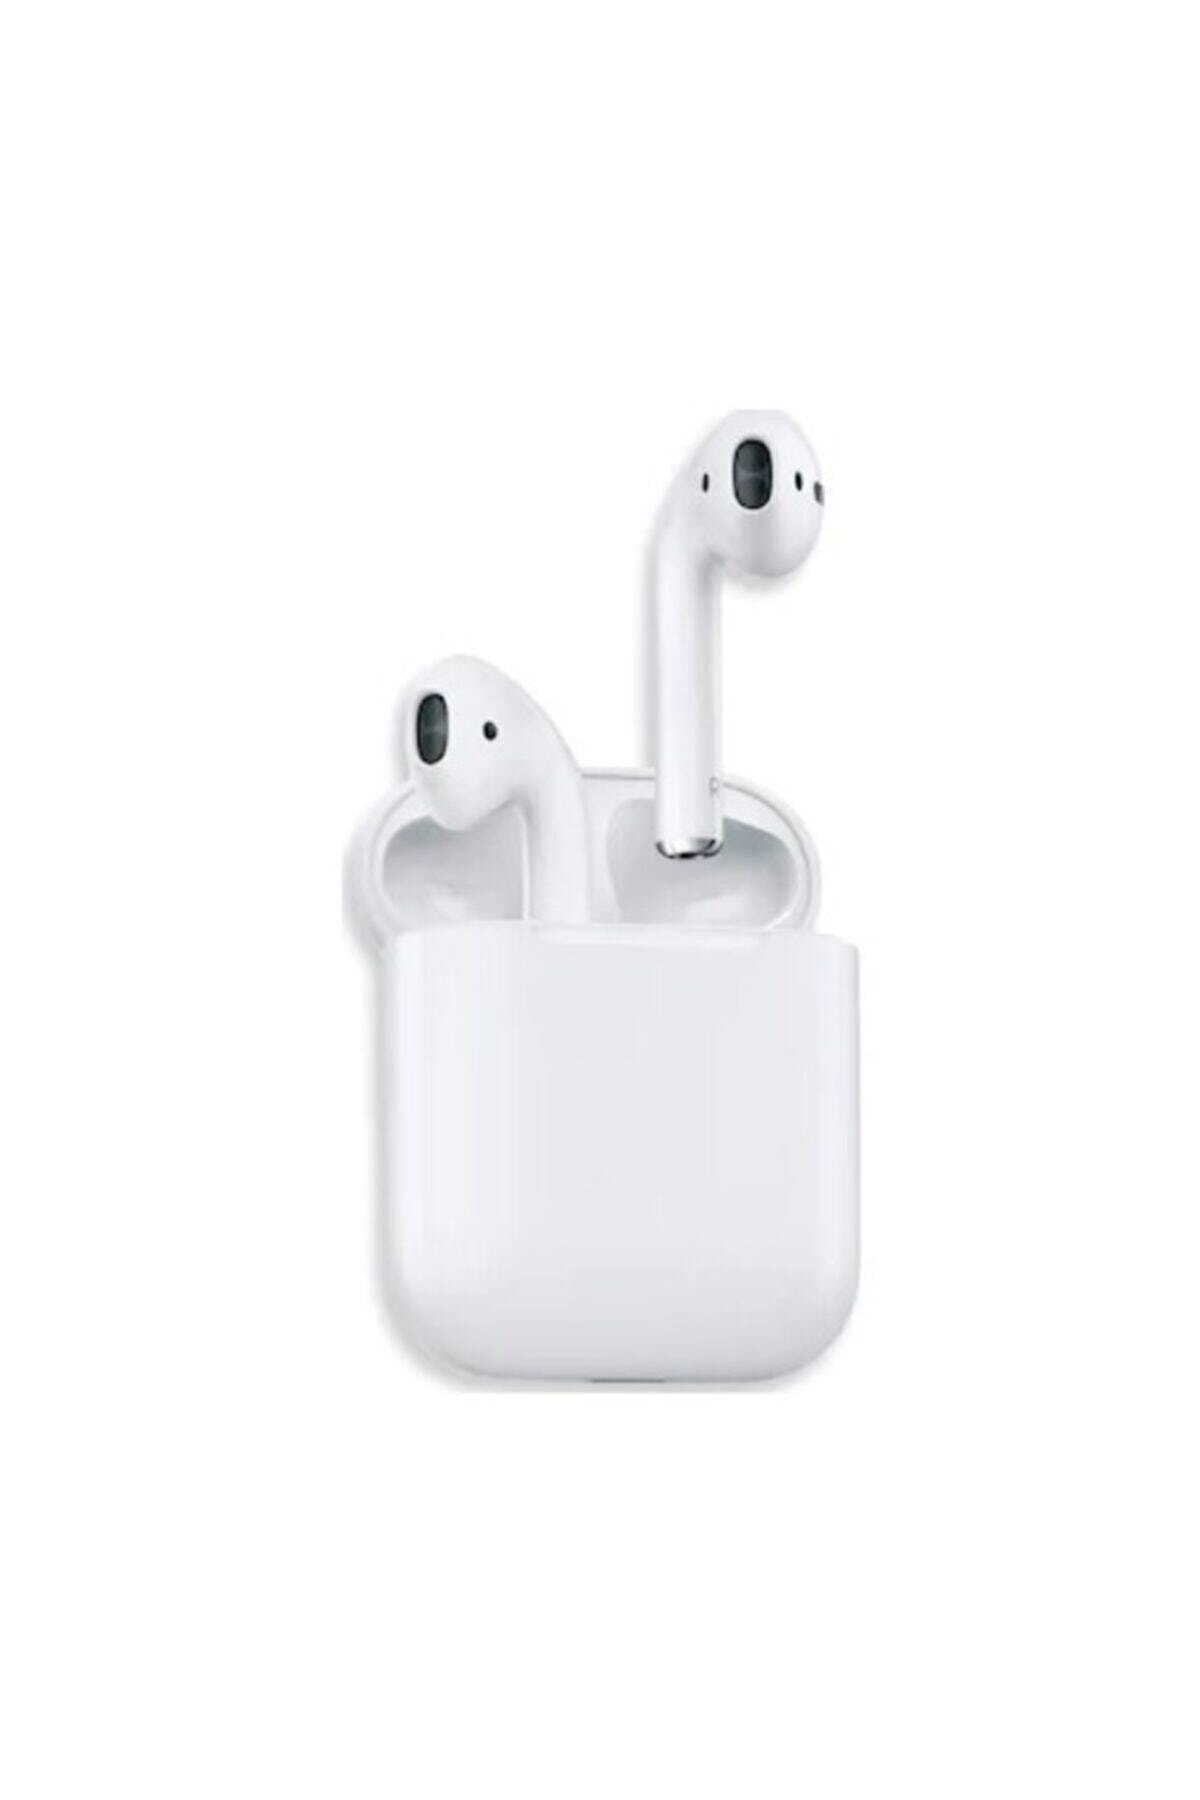 Tws Beyaz Airpods Blt-12 Şarj Üniteli Bluetooth 5.0 Kulaklık 1